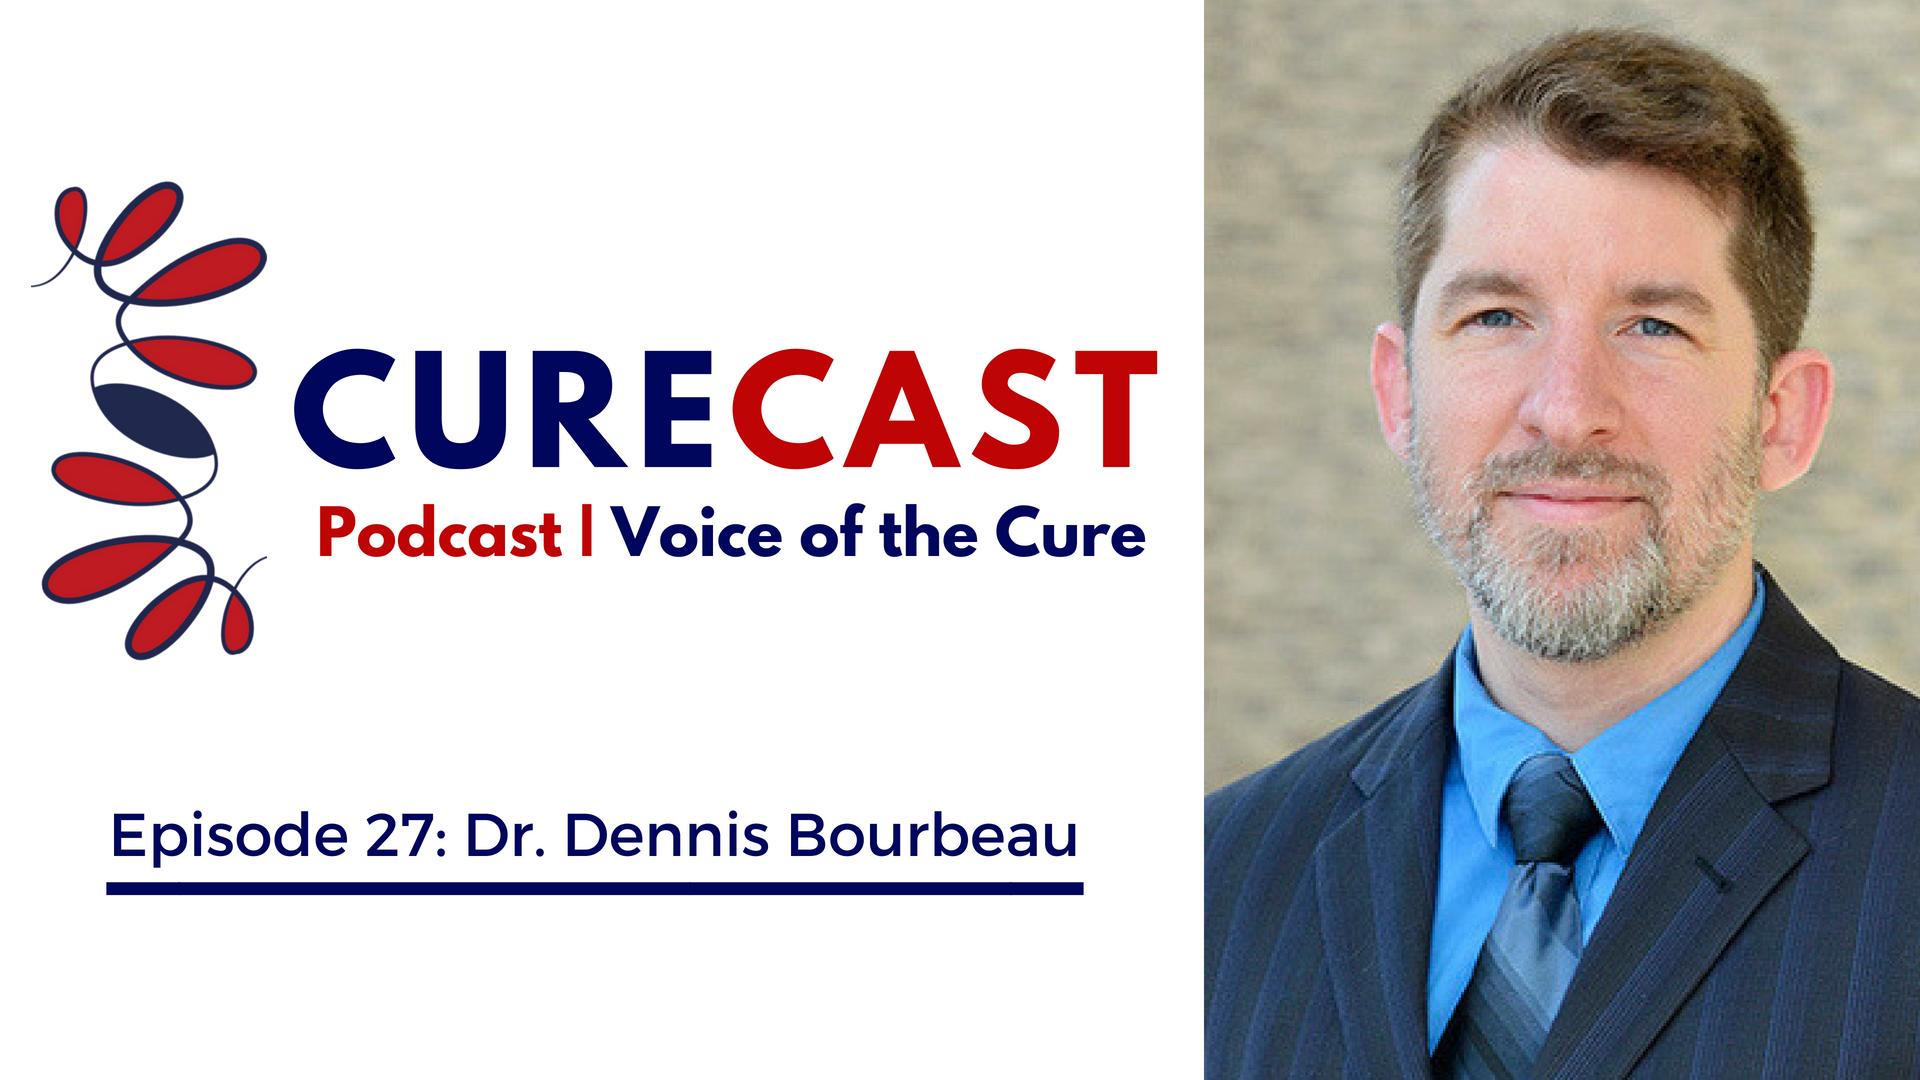 CureCast Interview with Dr. Dennis Bourbeau